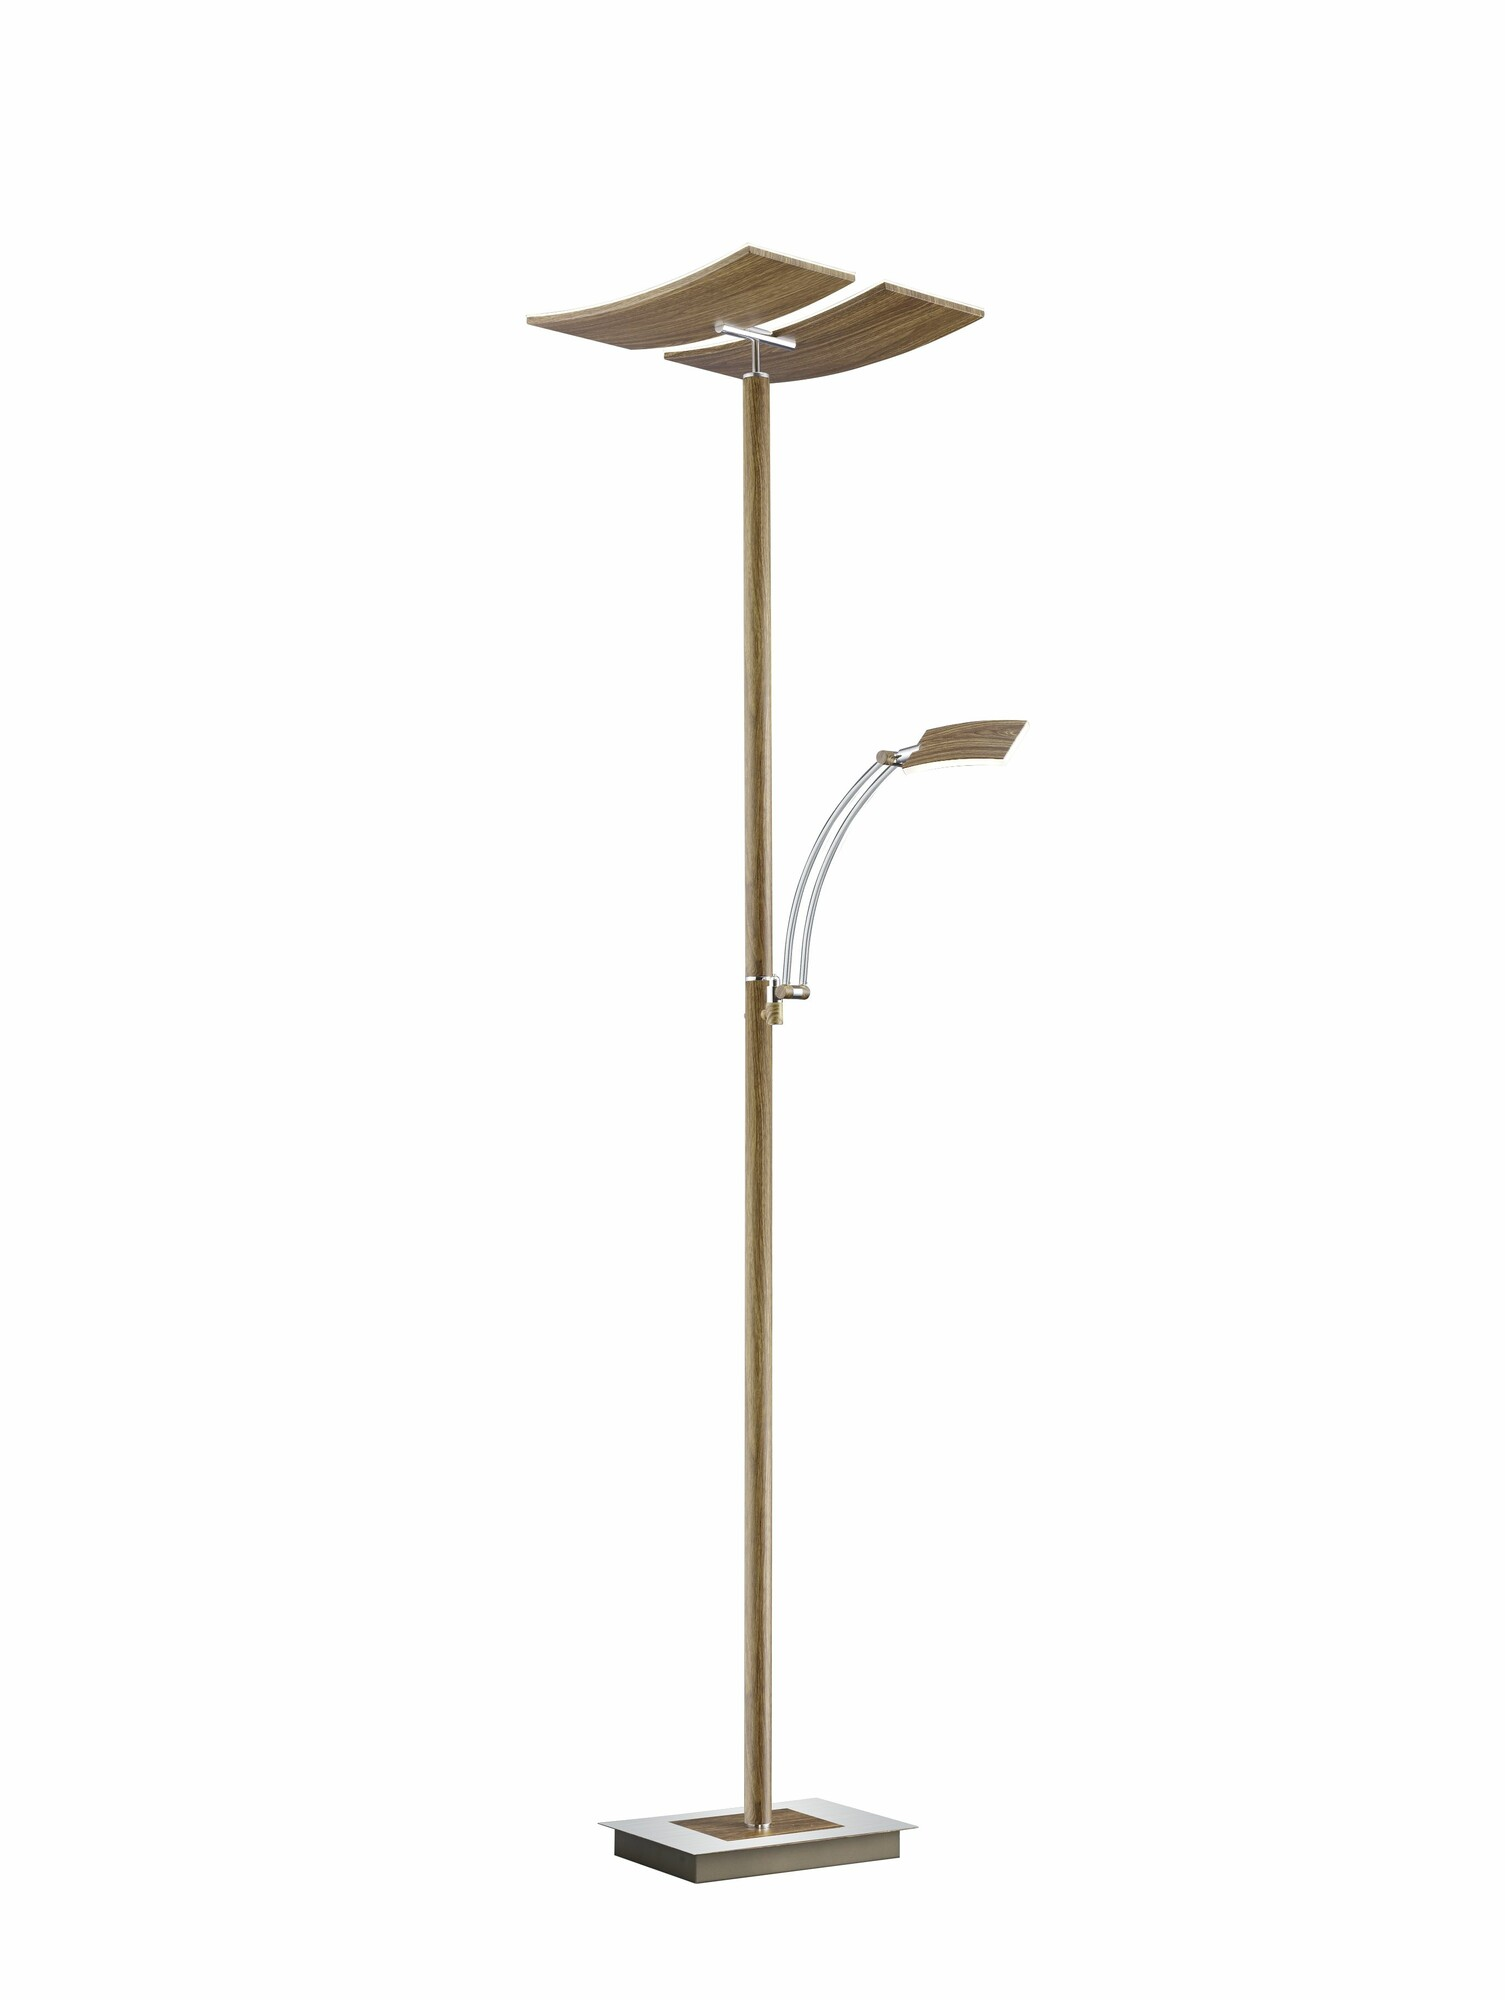 DUO Lampadaire LED 2x30W/3000lm Marron